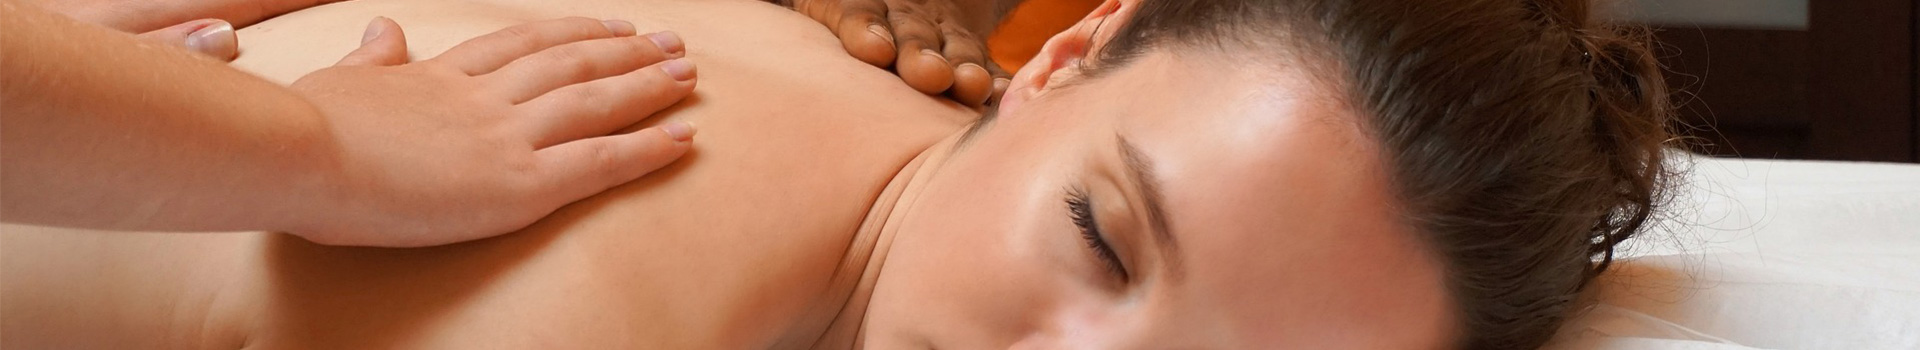 Massage Service Eccleston